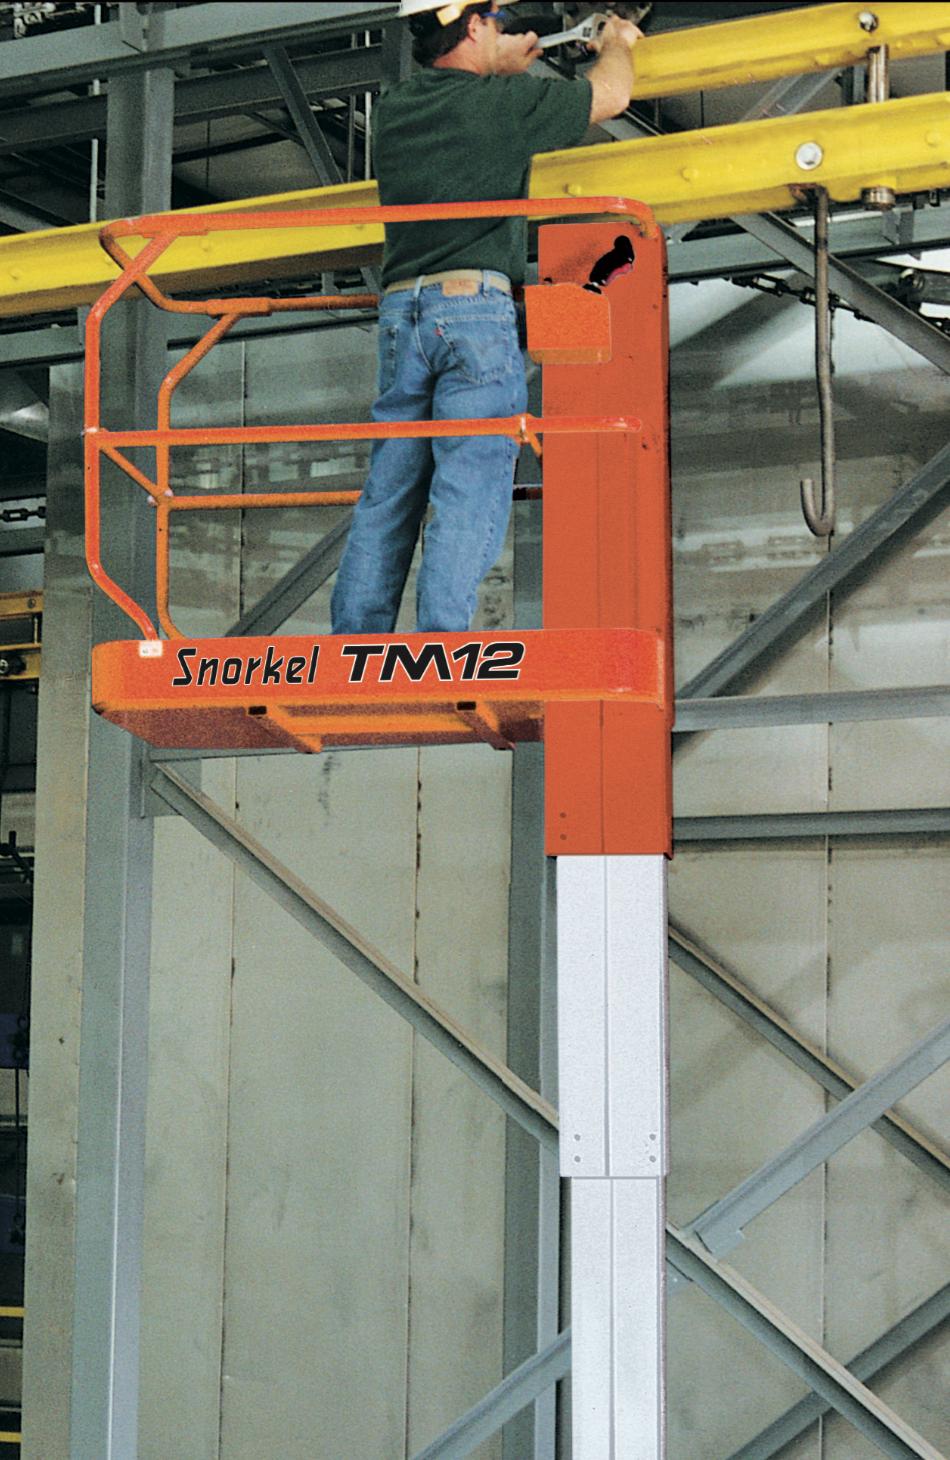 Snorkel TM 12 Mast Lift